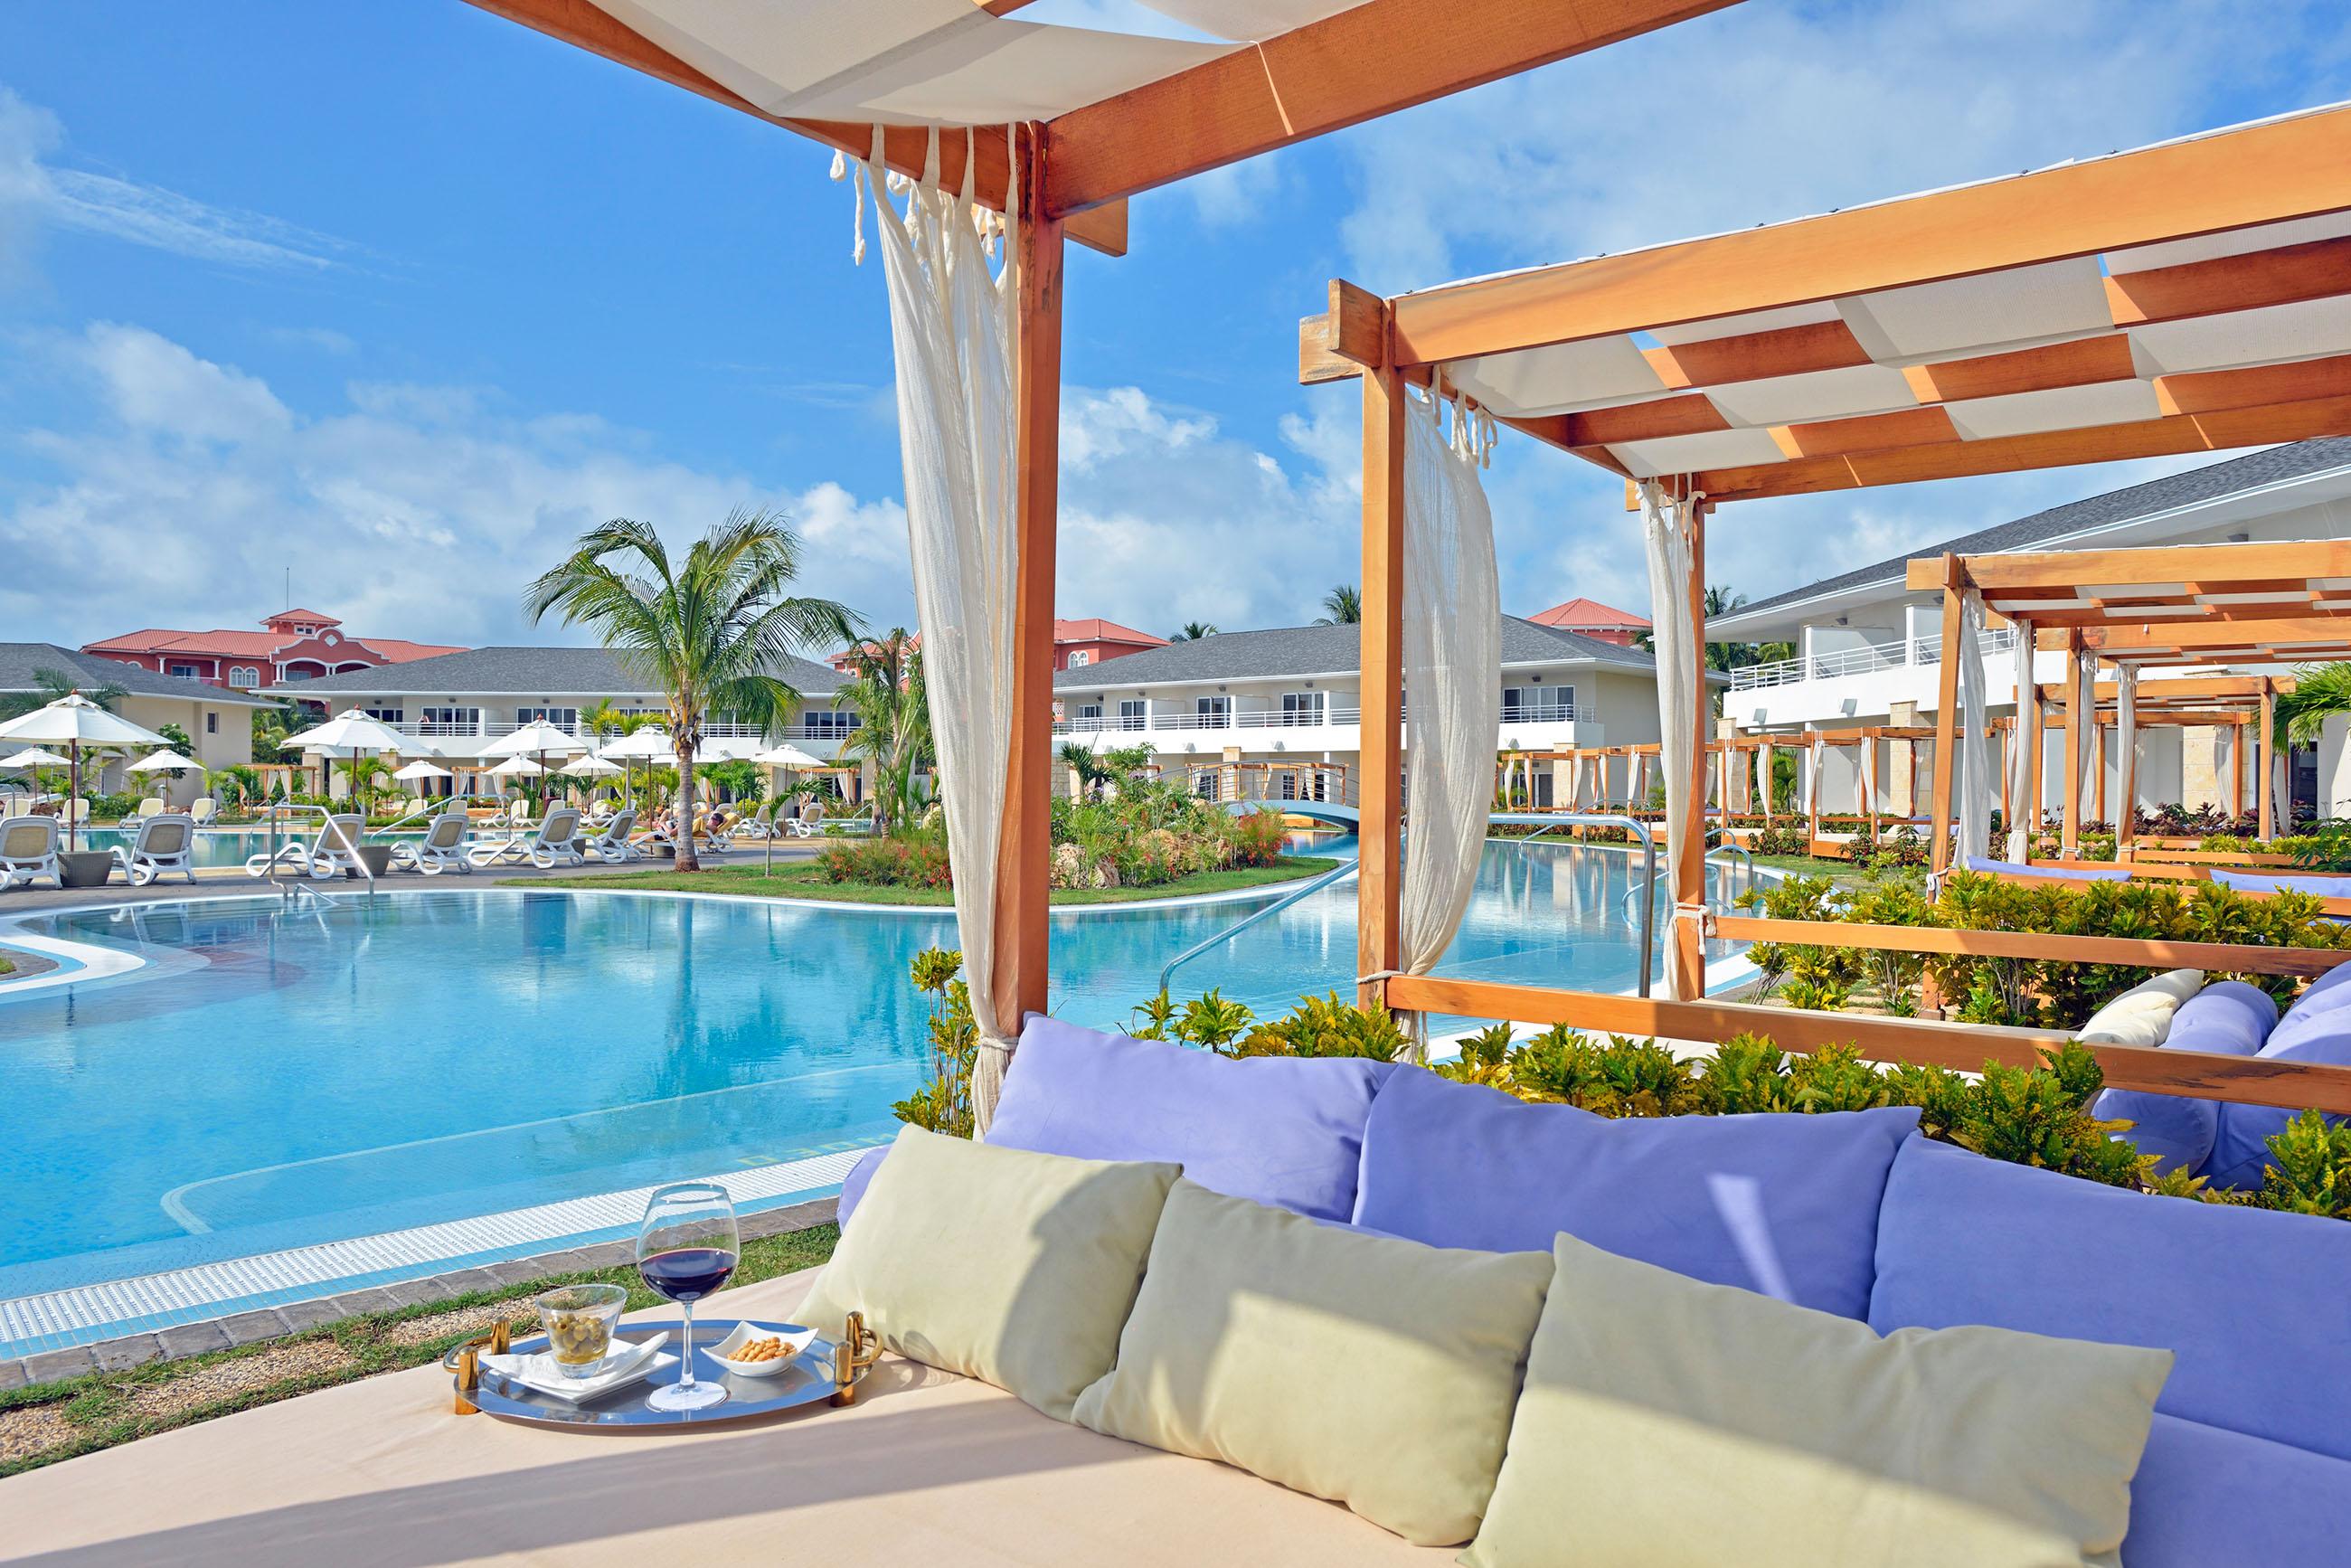 https://bubo.sk/uploads/galleries/5007/136paradisusprincesadelmar-beach_concierge_swim-up_pool_royal_service.jpg